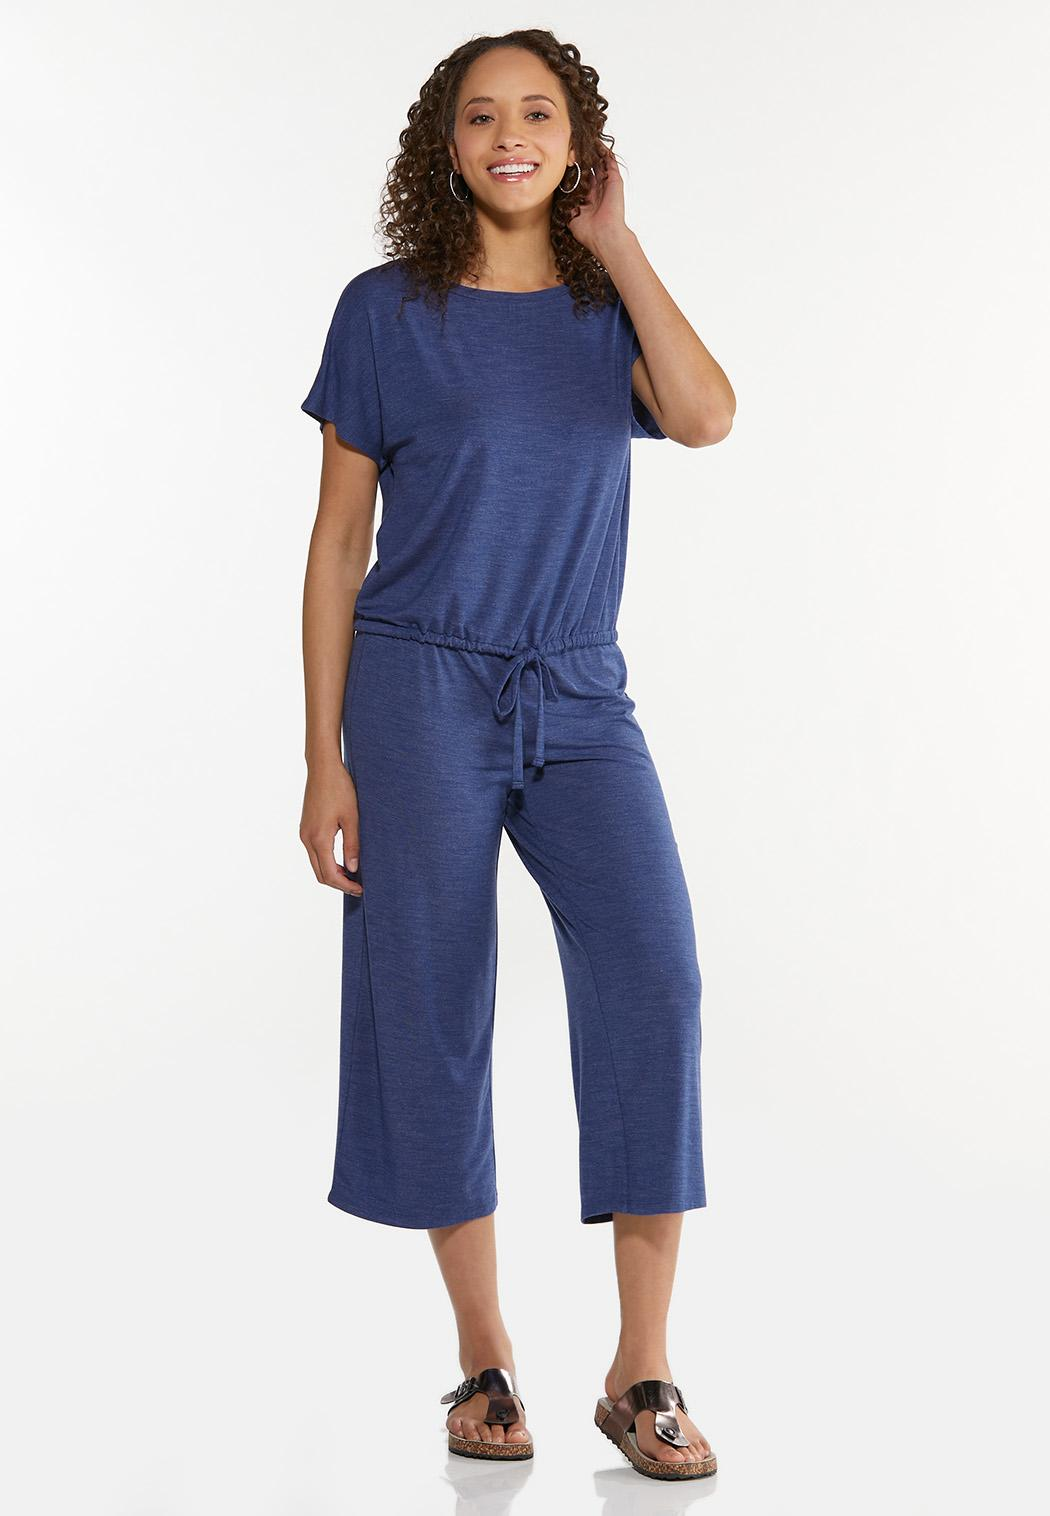 Cropped Vintage Blue Pants (Item #44606879)